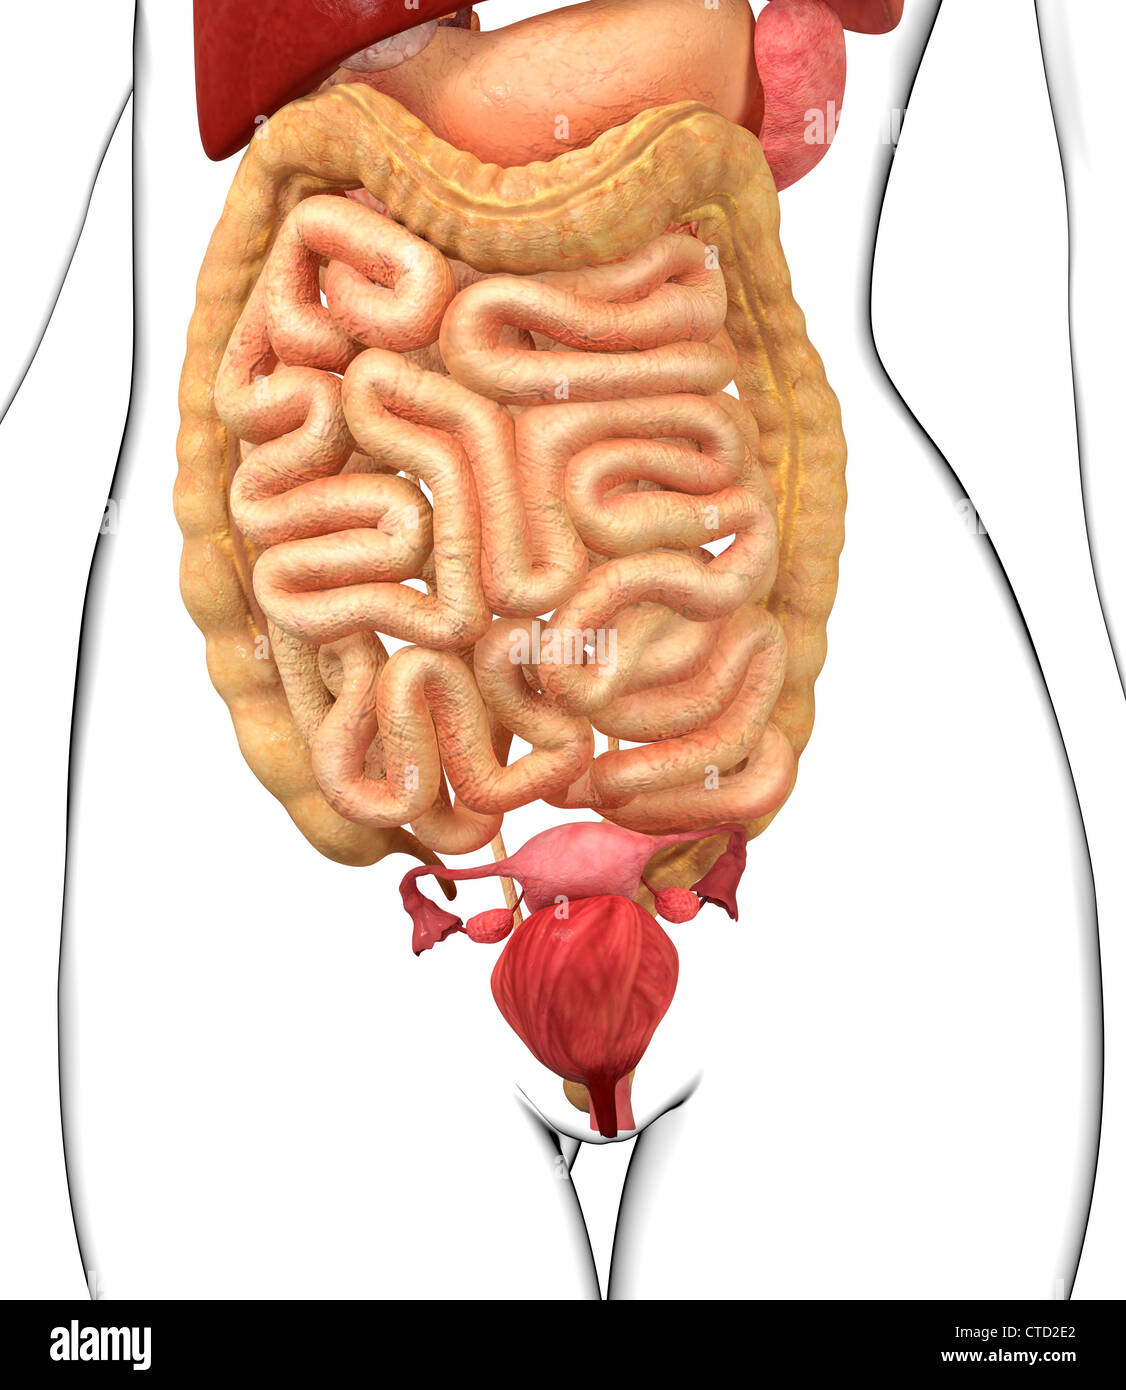 Female Abdominal Anatomy Imágenes De Stock & Female Abdominal ...